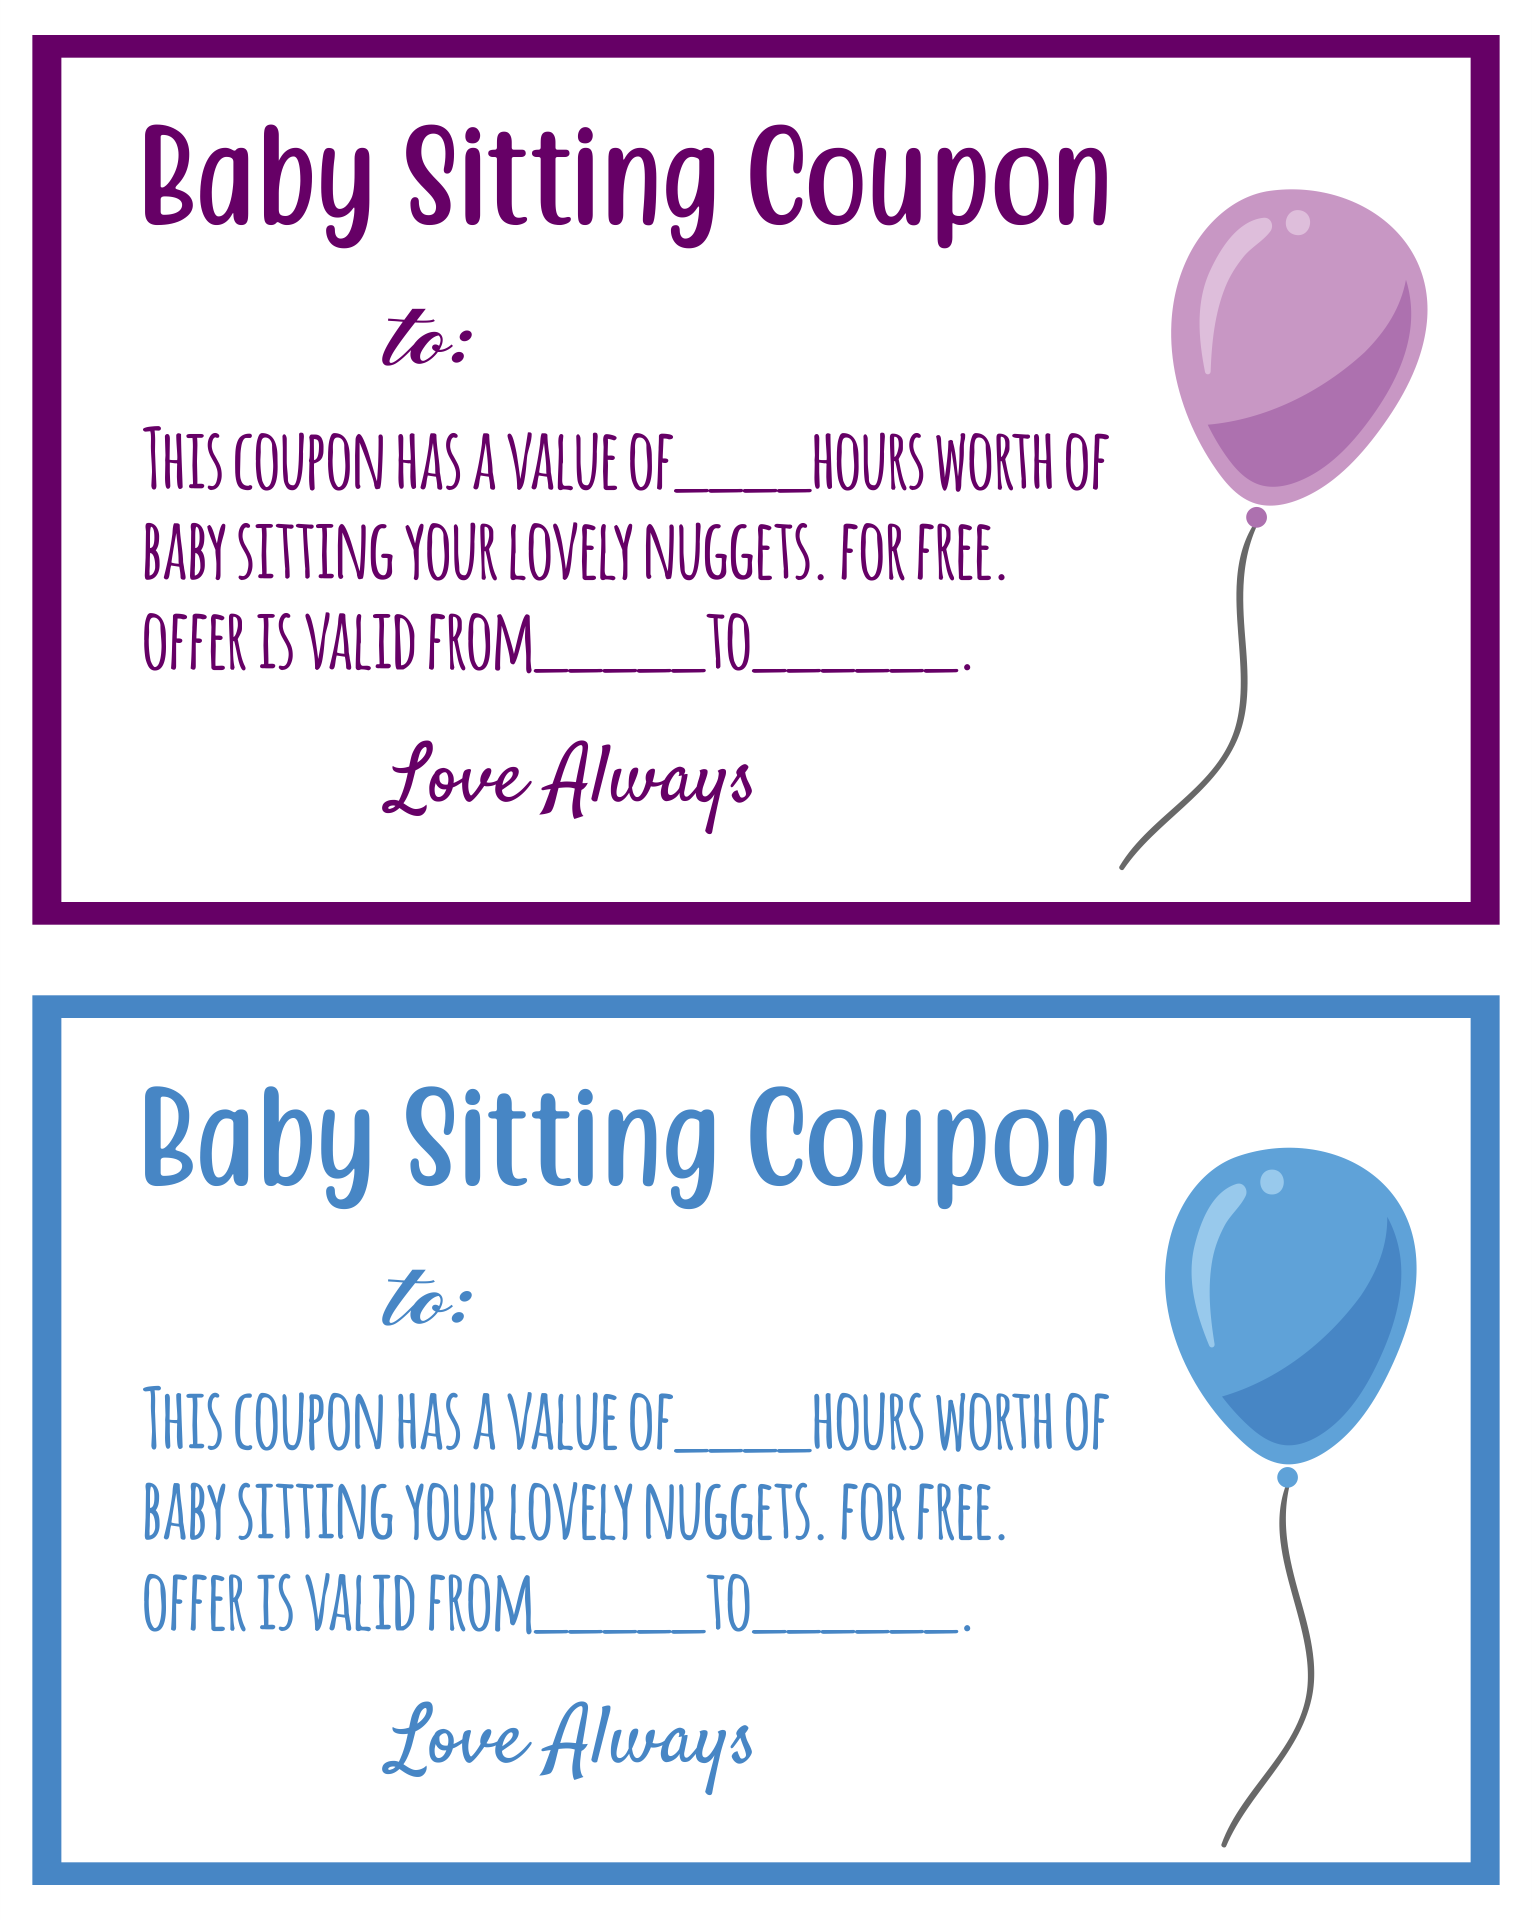 Babysitting Coupon Clip Art